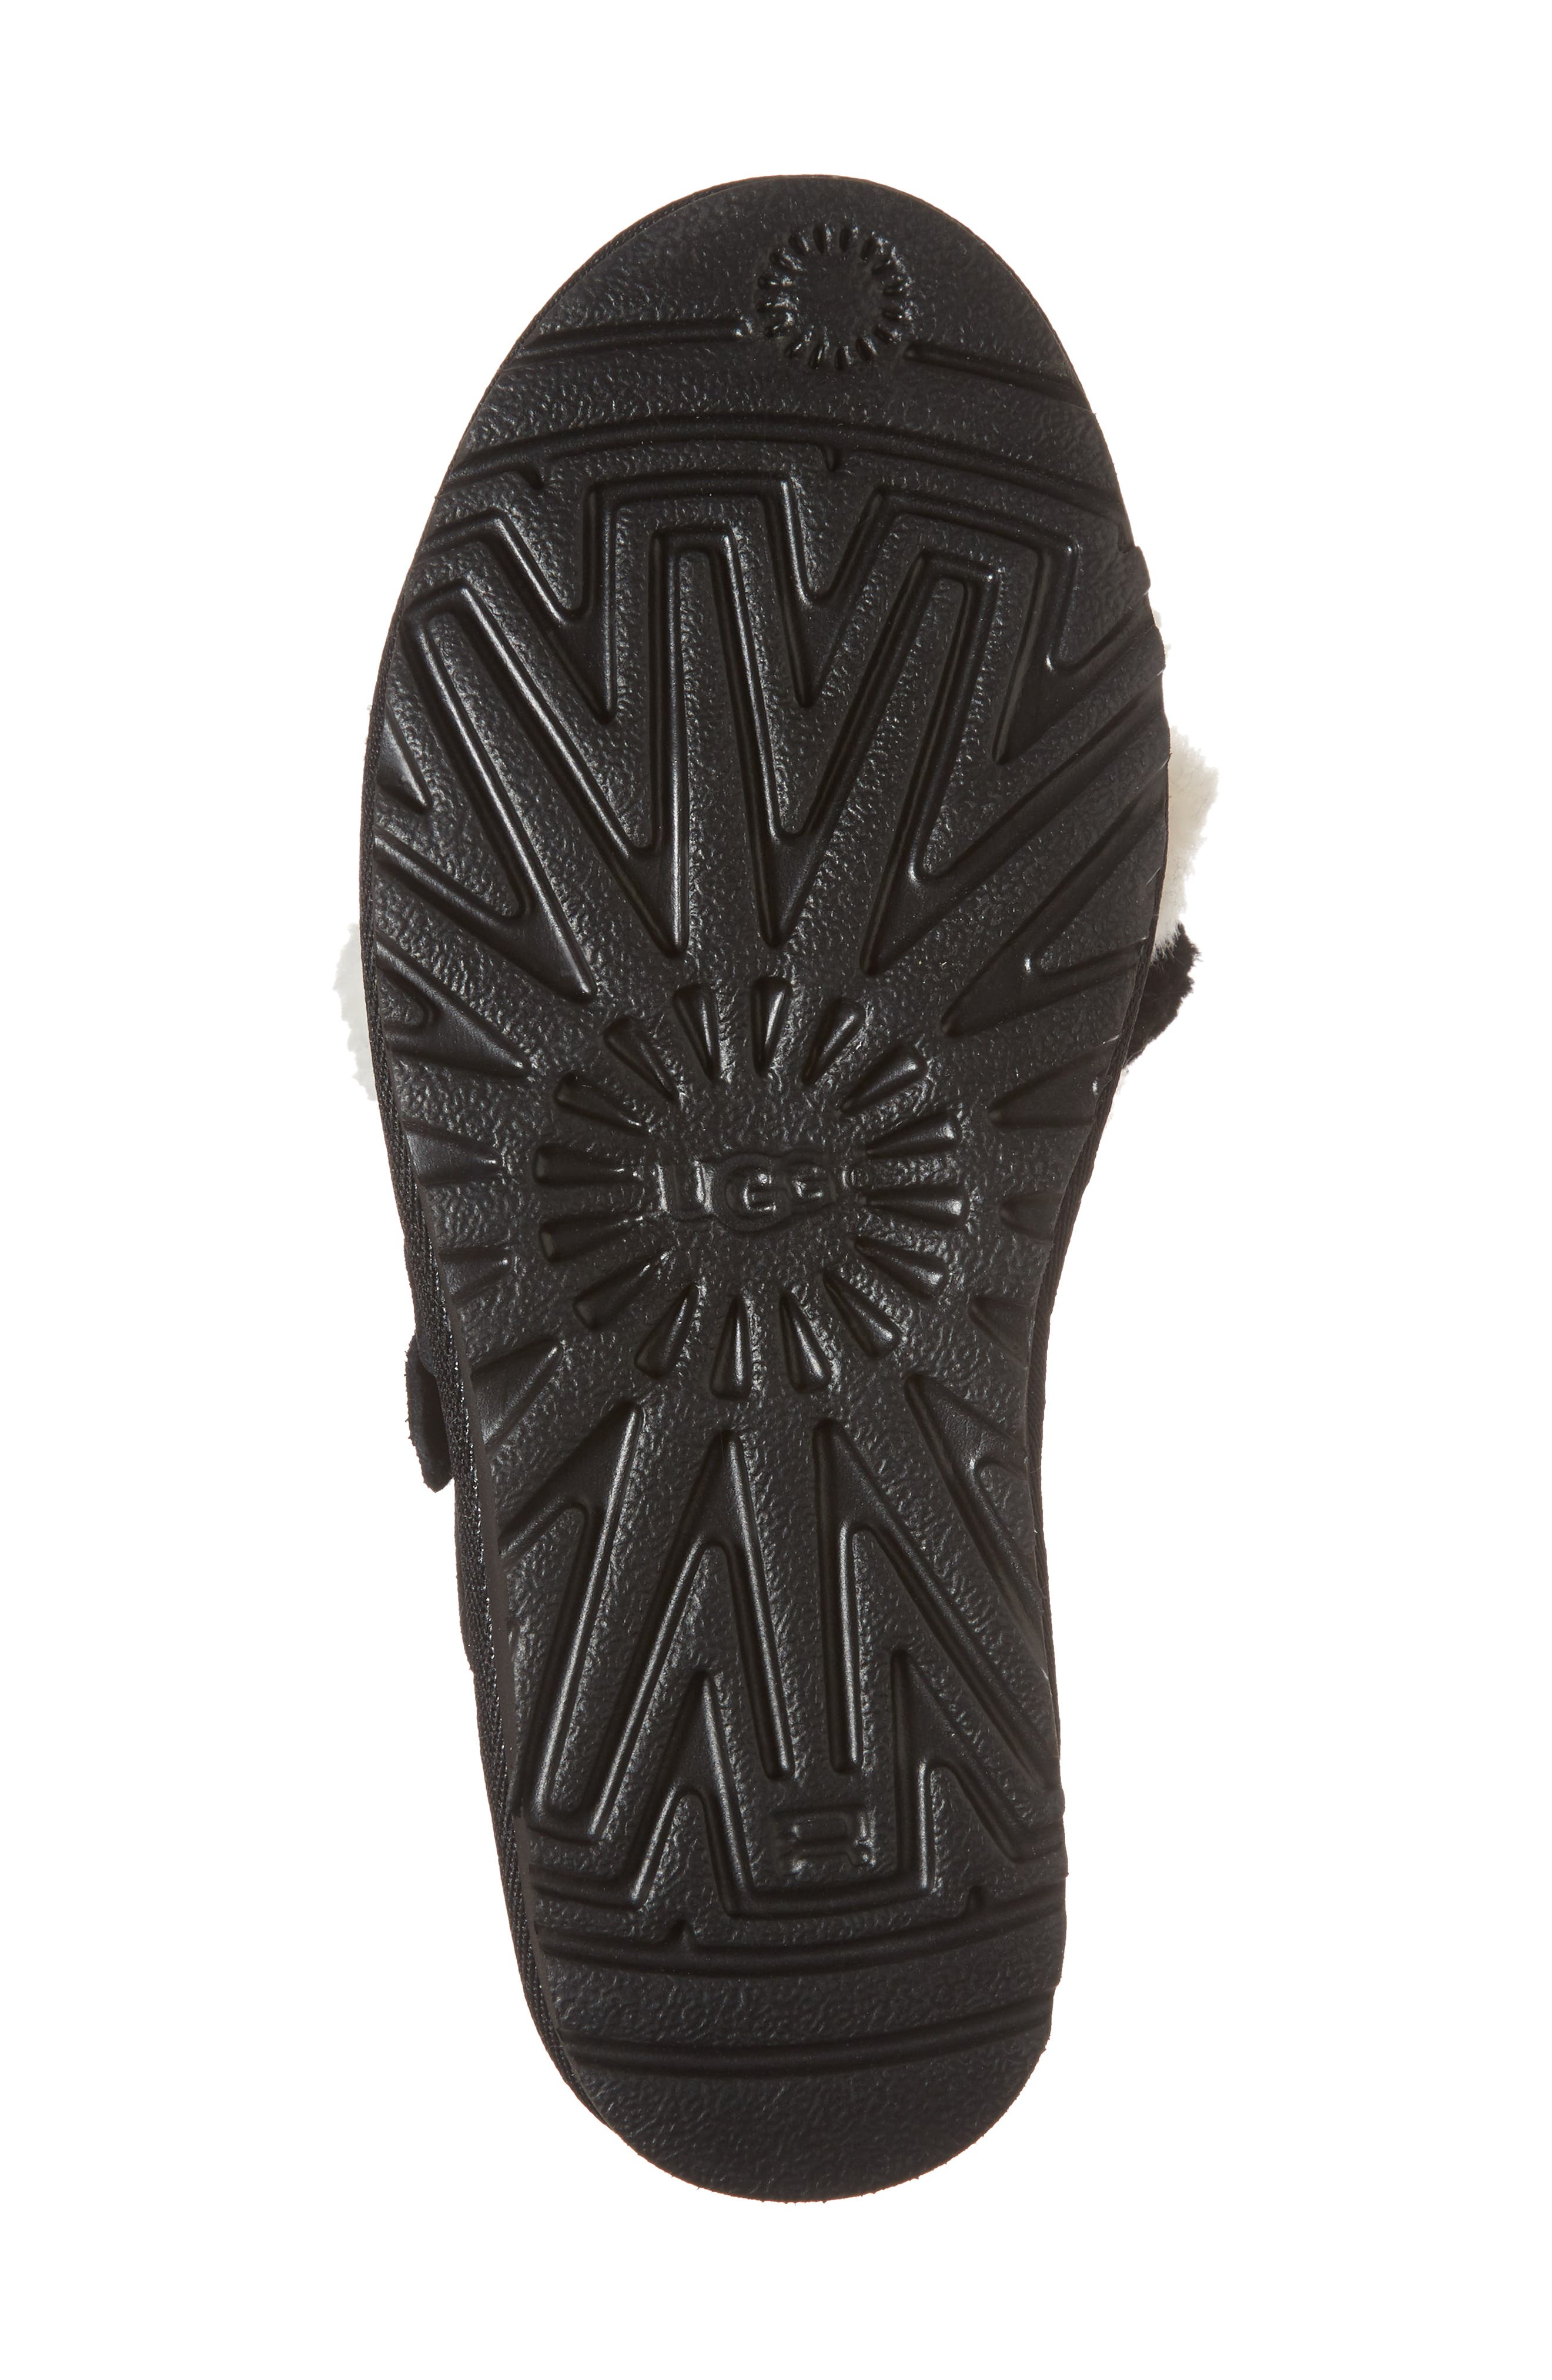 Clio Pom Pom Slide Sandal,                             Alternate thumbnail 6, color,                             Black Suede